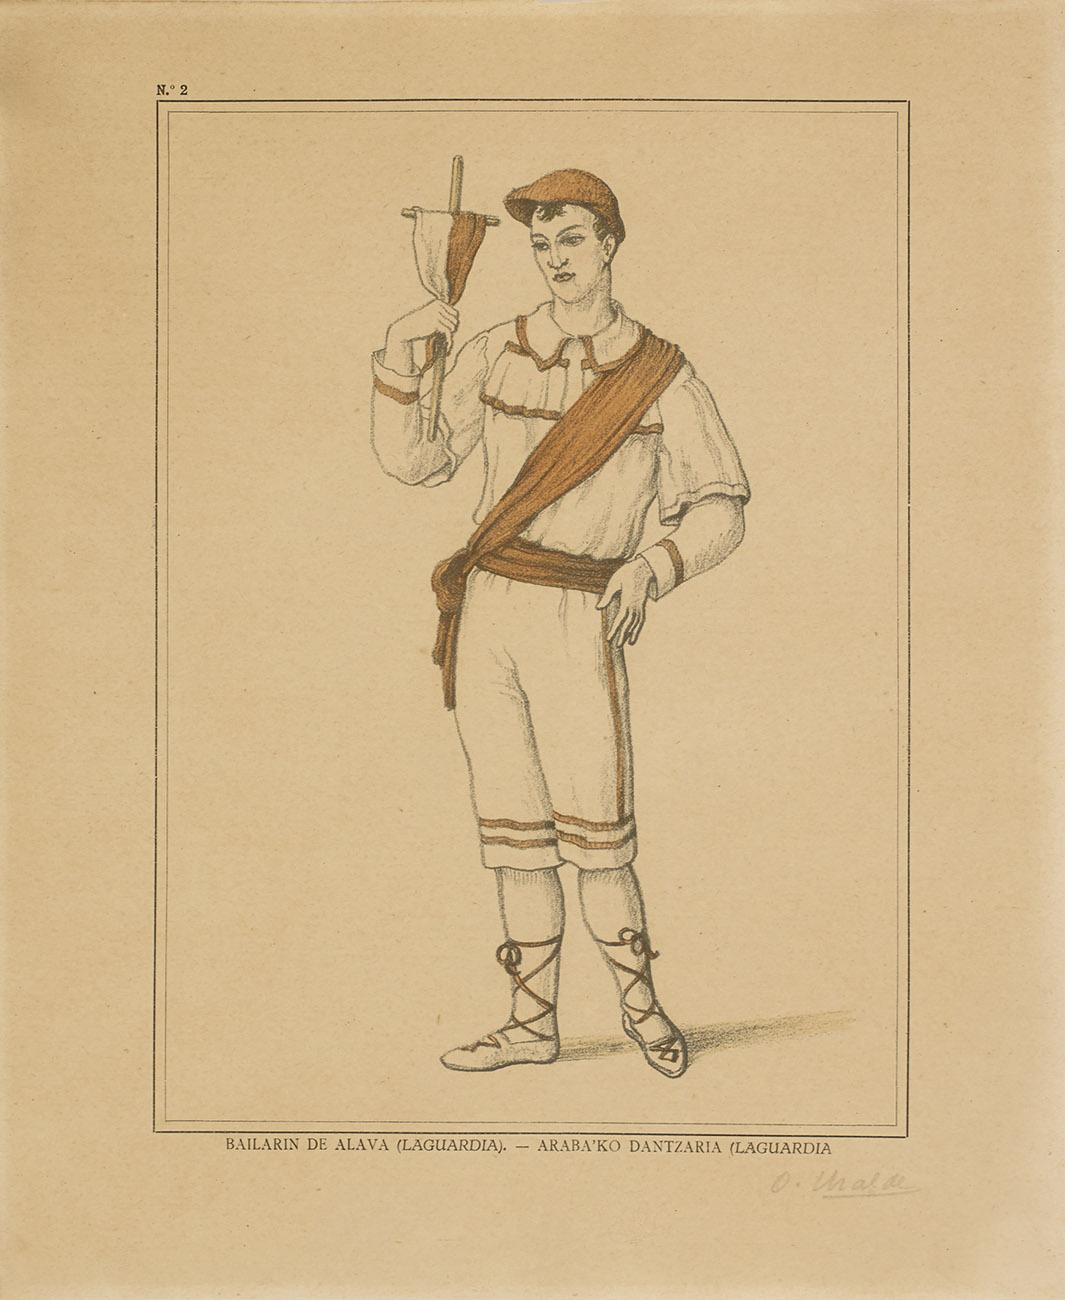 Bailarín de Álava (Laguardia) - Araba´ko dantzaria (Laguardia)